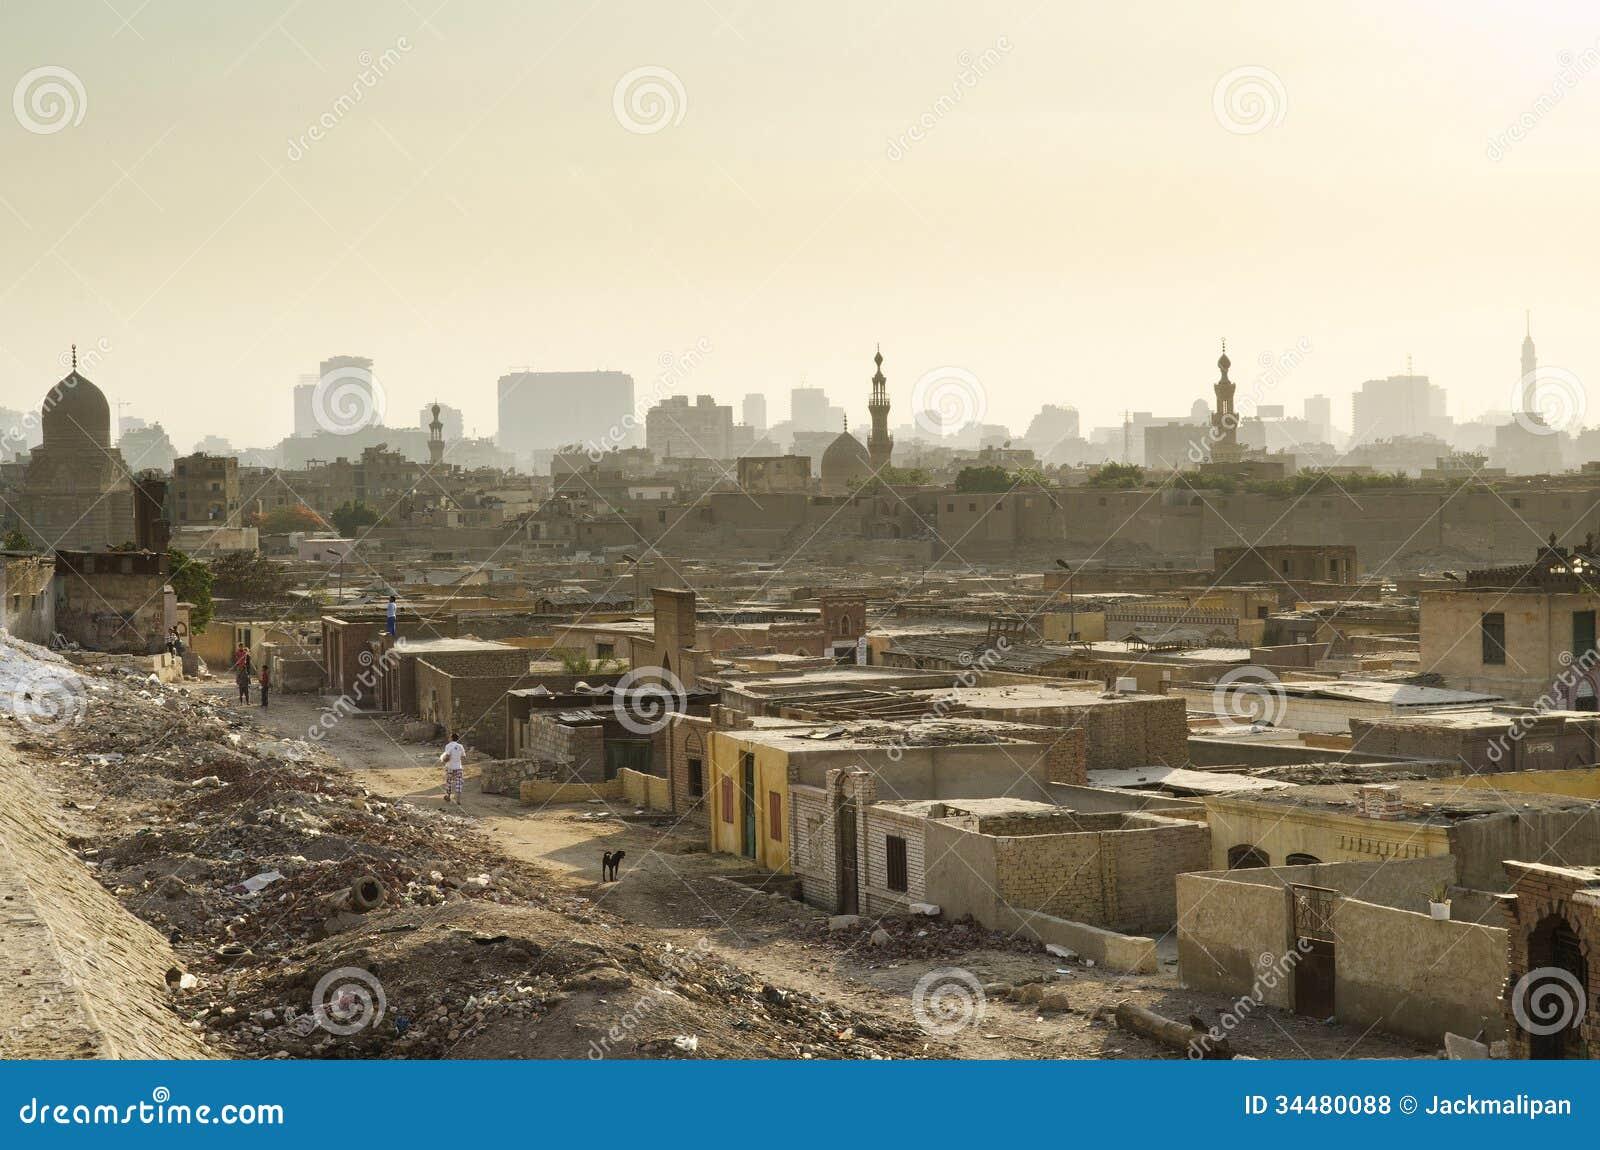 City Of The Dead Slum In Cairo Egypt Royalty Free Stock Photos